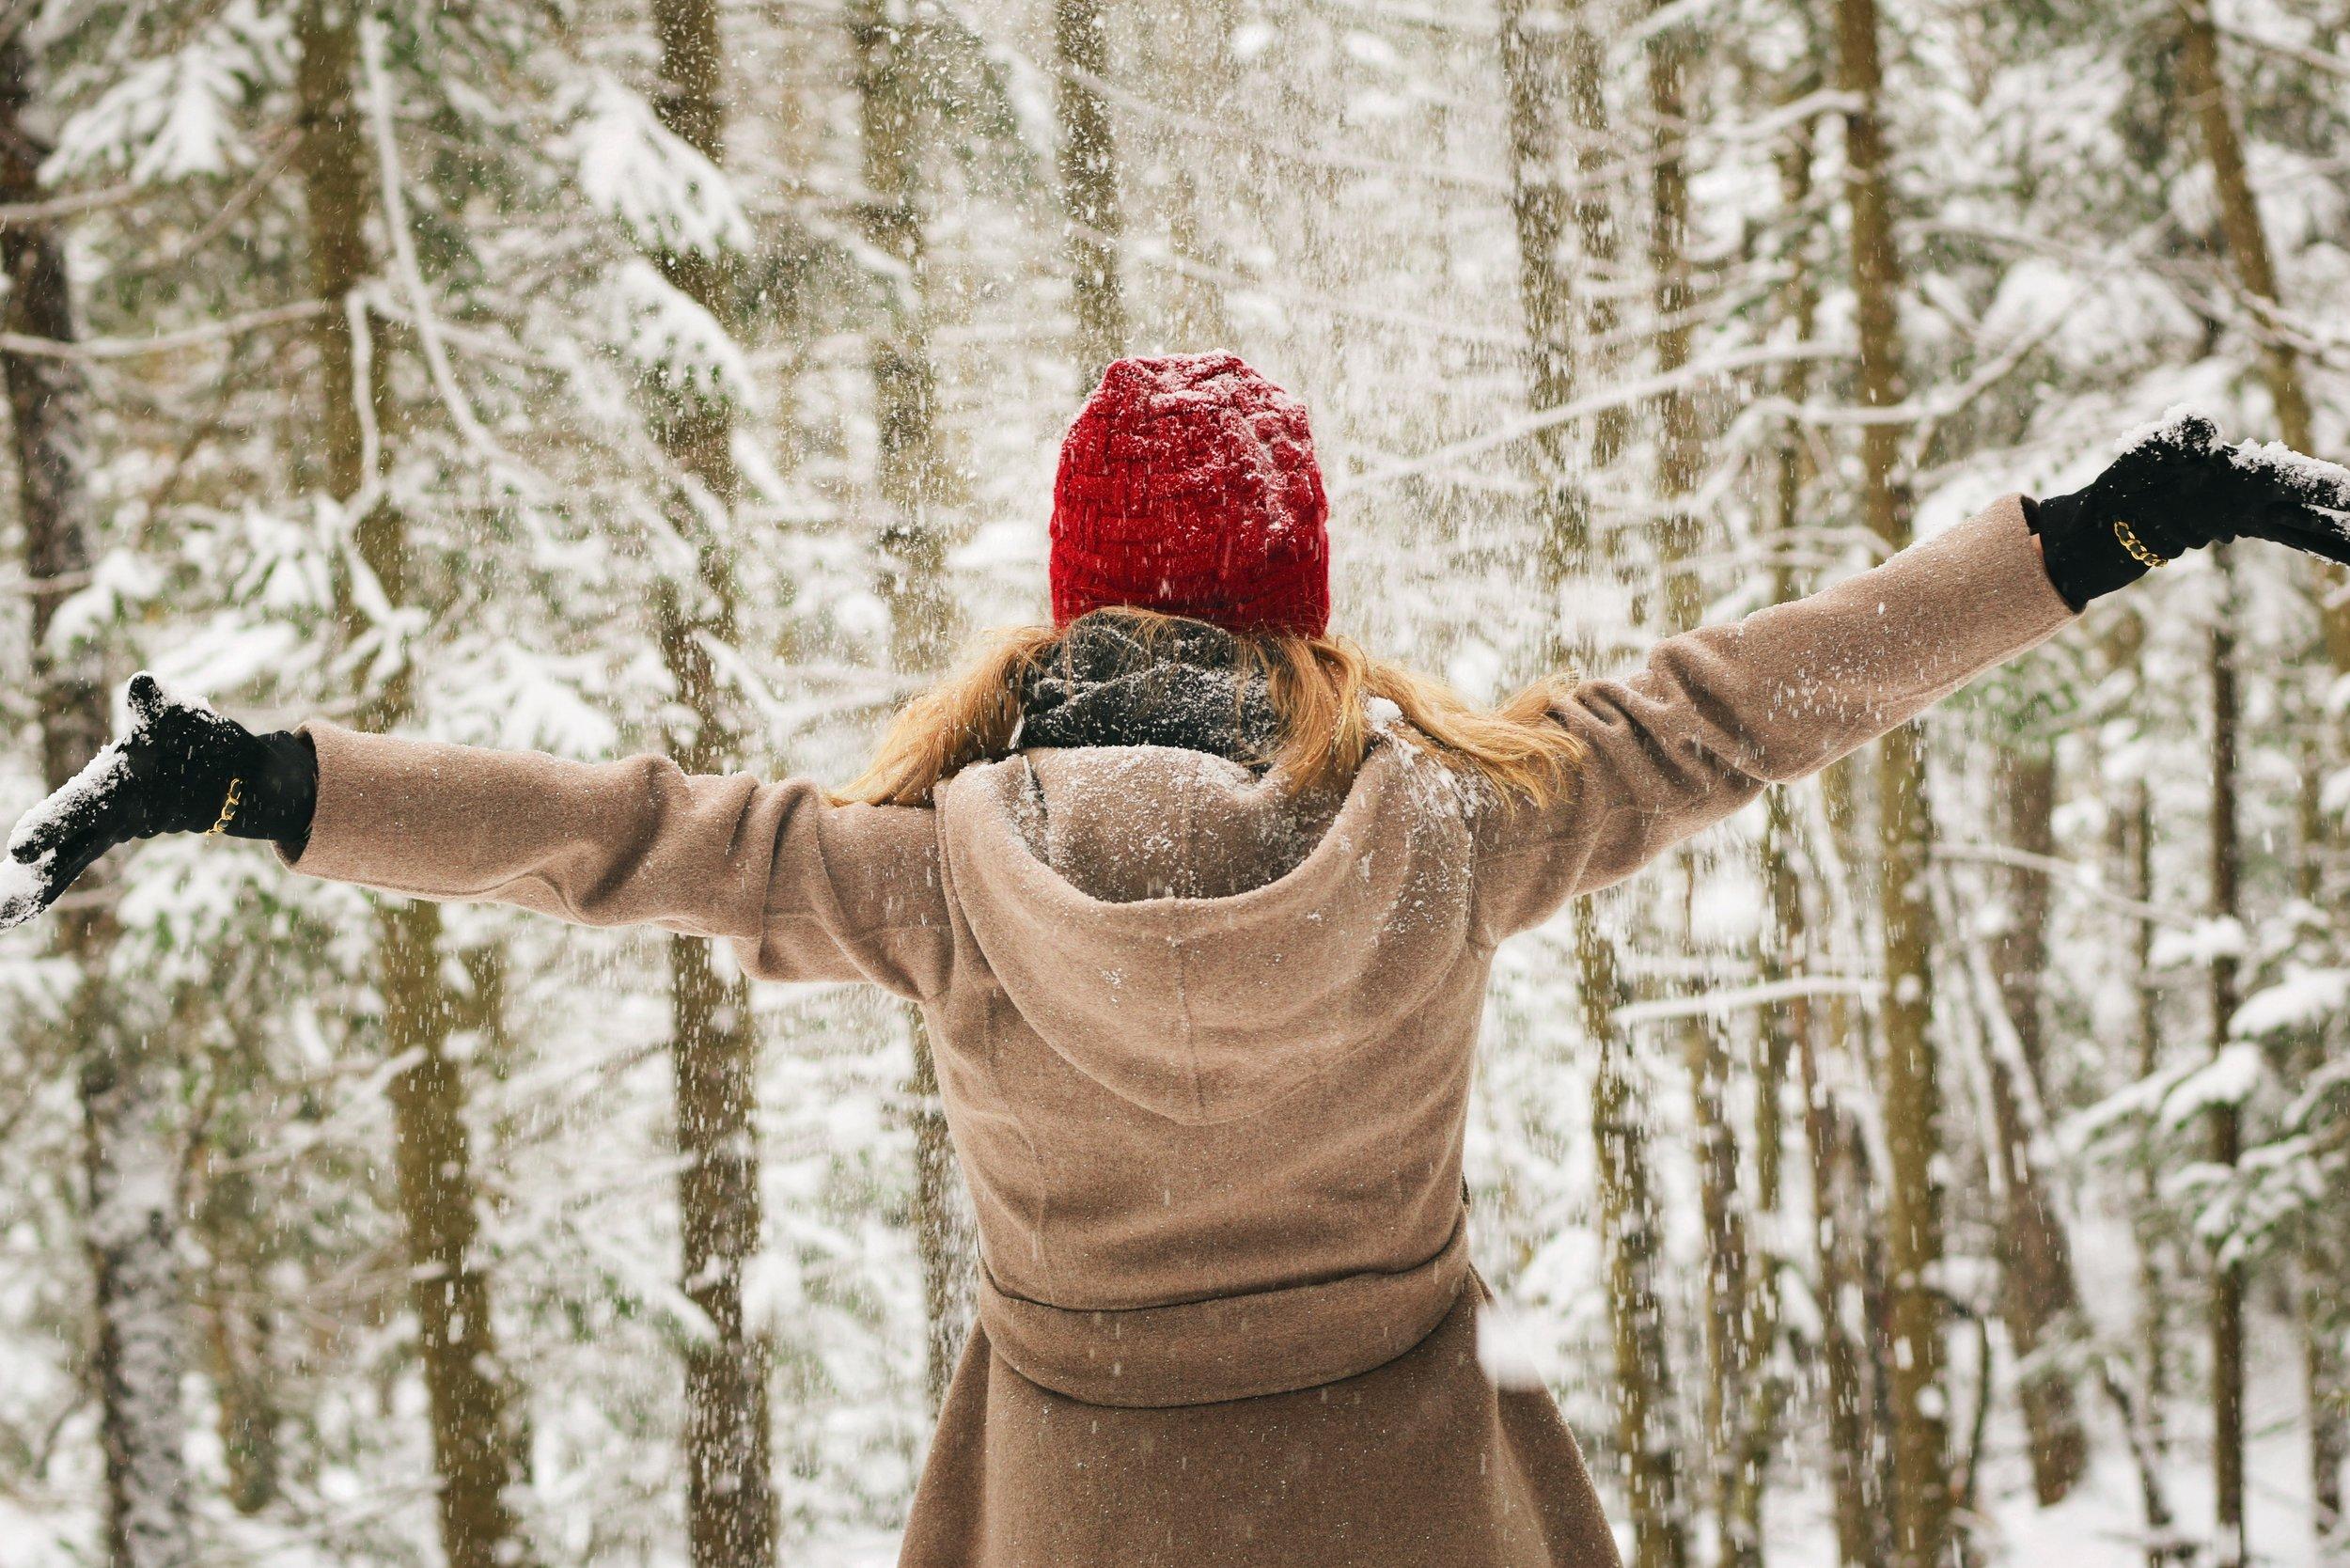 bonnet-cheerful-cold-700535.jpg